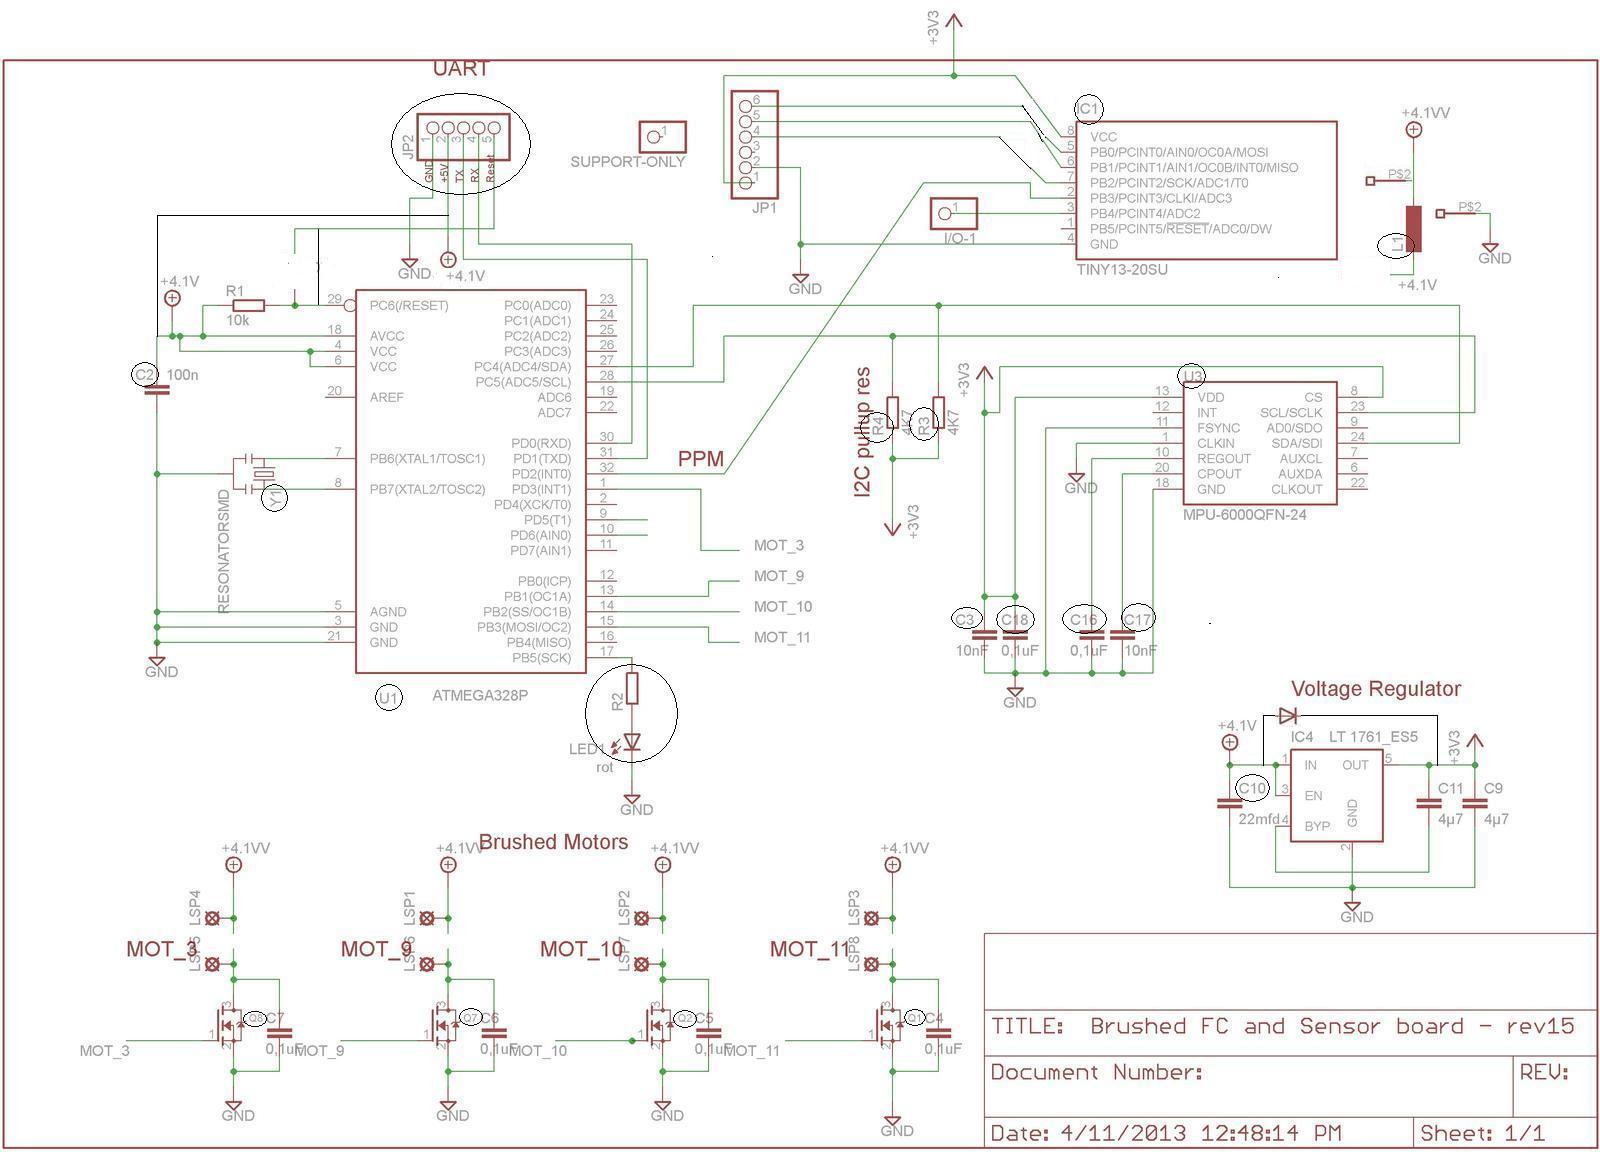 kk2 1 wiring diagram mini